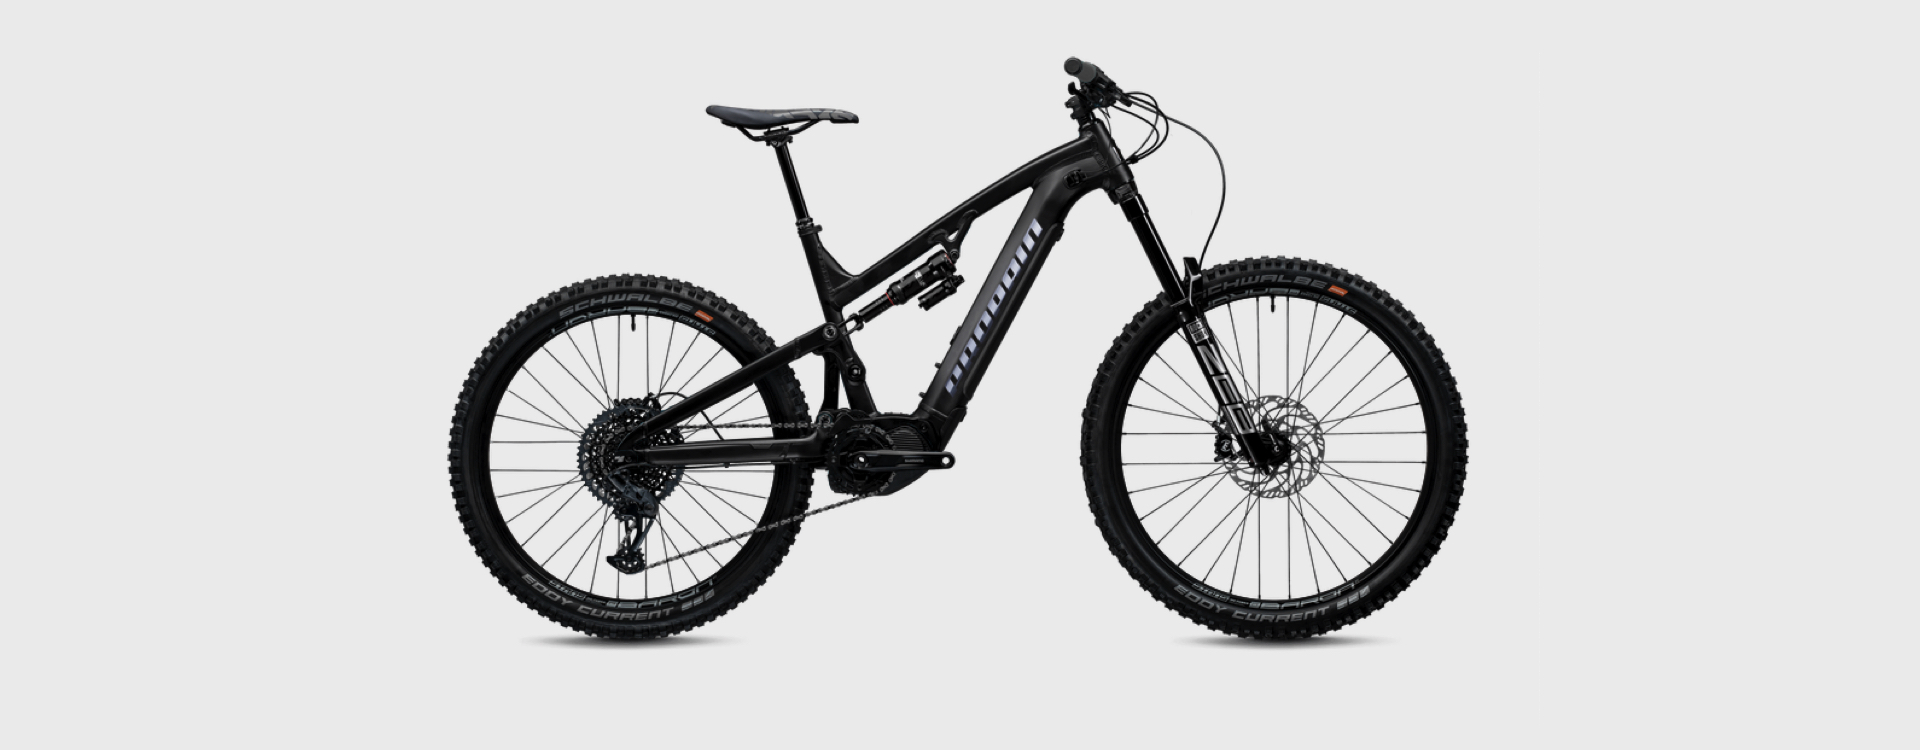 Bike Verleih Gummersbach Propain Bikes Testcenter NRW Ekano 10 - AL - XL - Mix - Black - 1920x750